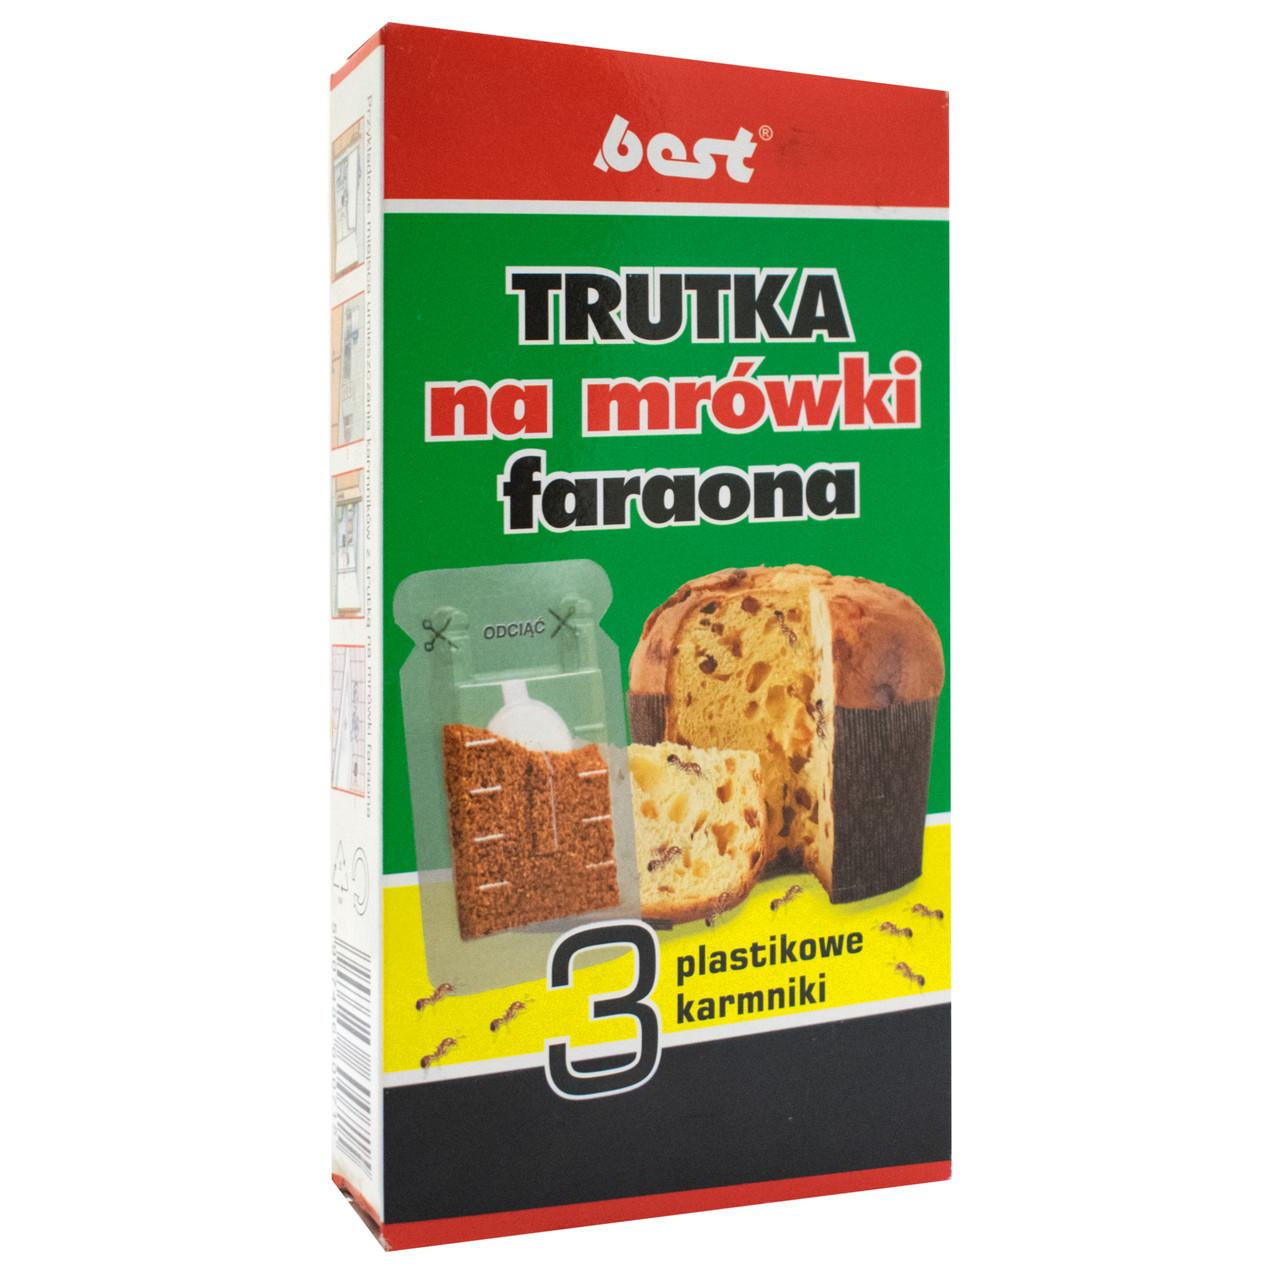 Ловушки для муравьев Trutka na mrowki faraona 3x2.5 г Best Pest